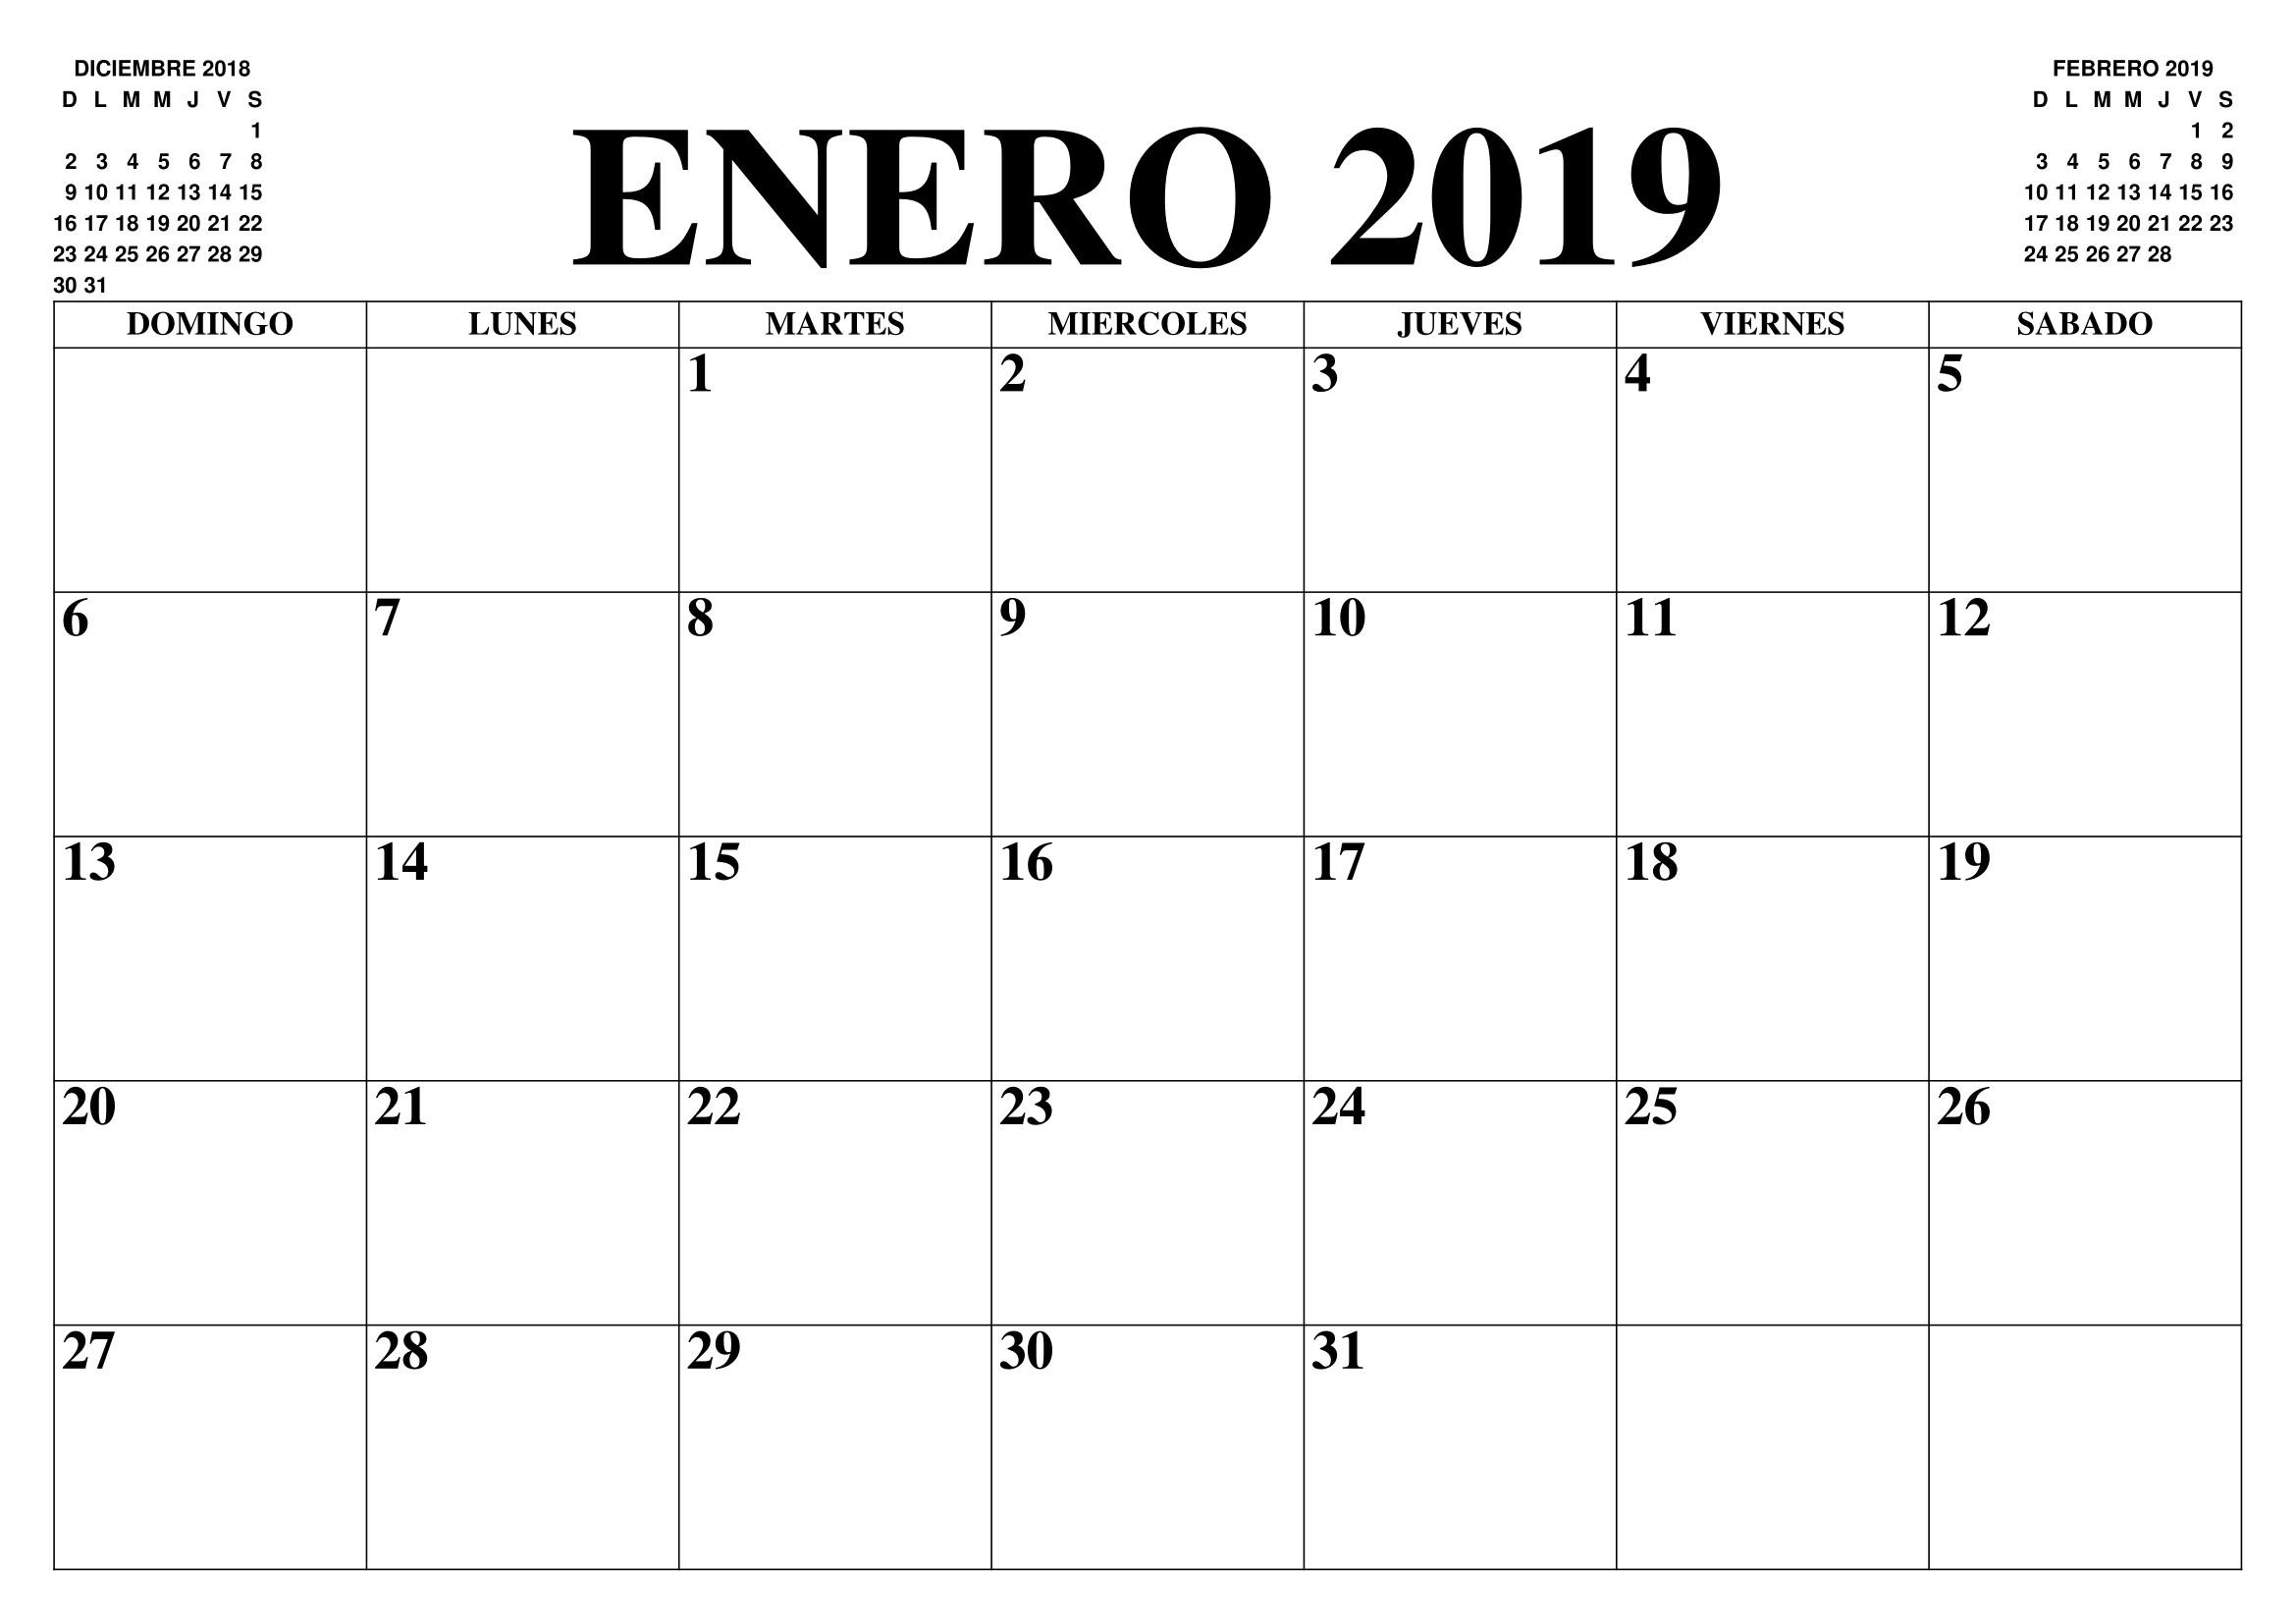 Calendario 2019 Chile Con Feriados Para Imprimir Pdf Más Populares Calendario Enero 2019 Chile Pdf – Calendario 2018 Of Calendario 2019 Chile Con Feriados Para Imprimir Pdf Actual Calendario 2018 9 Fondo Calendario May Blanco Csp Simple